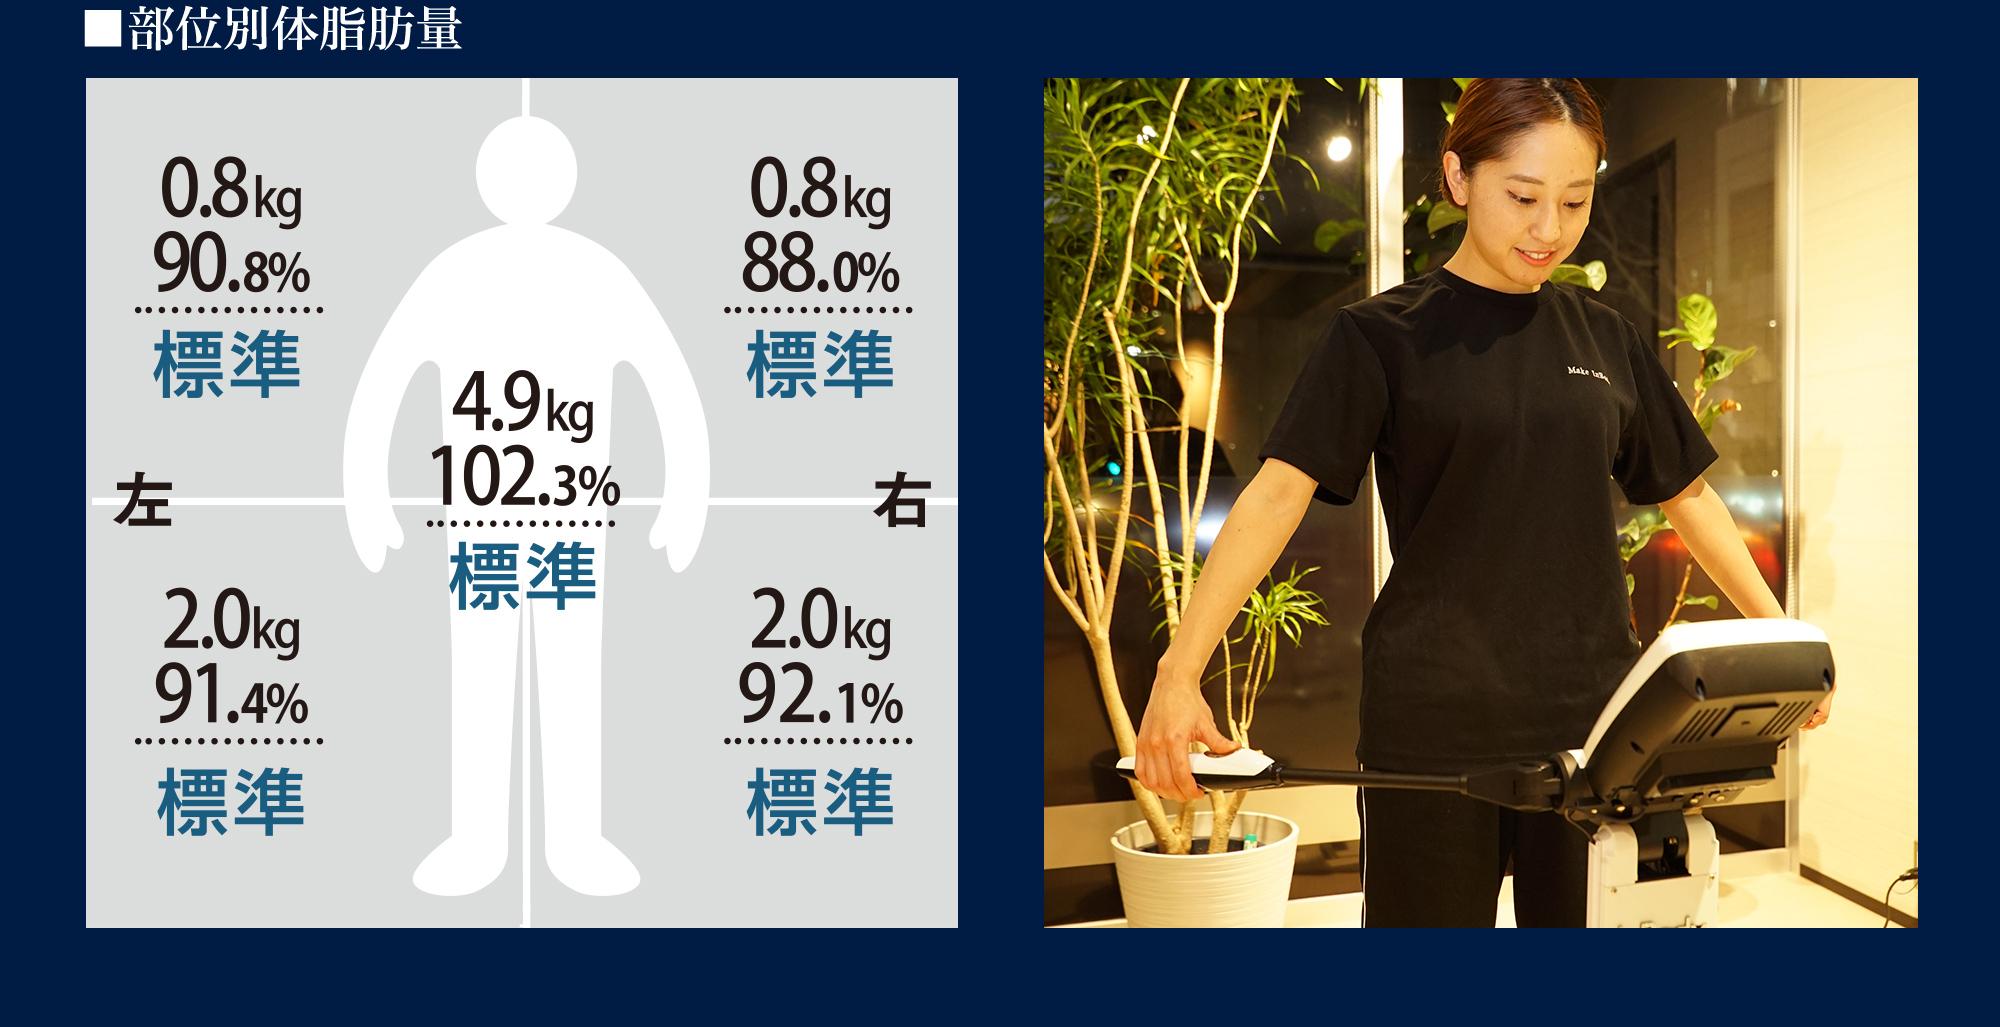 田中里菜(28)Height 154cm Weight44.9kg